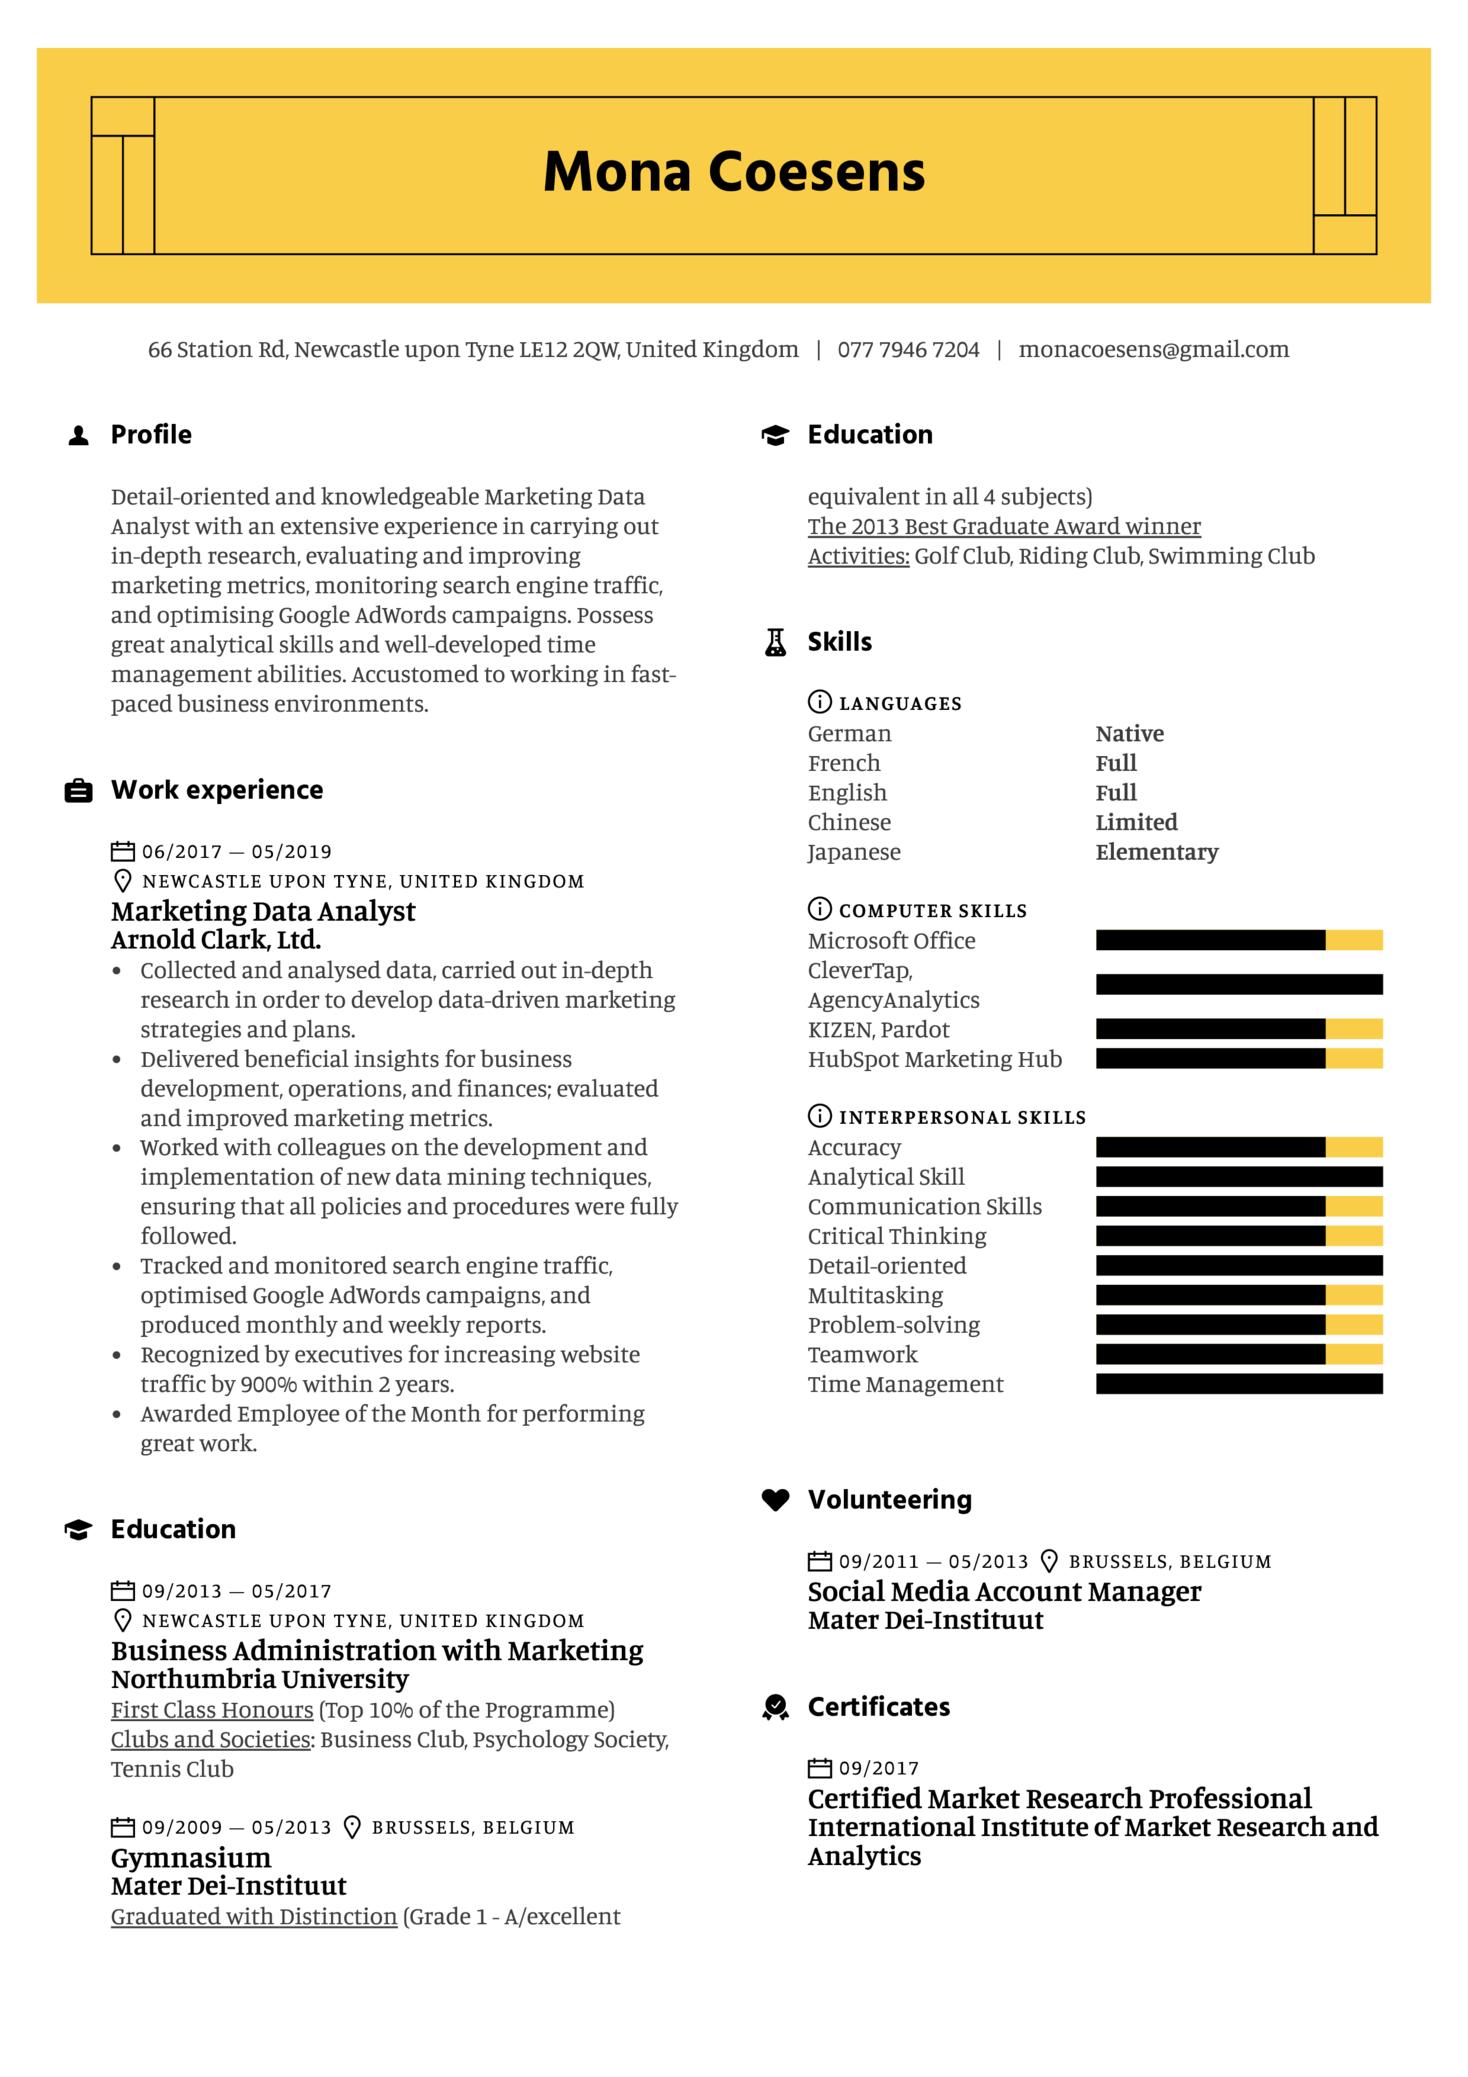 Marketing Data Analyst Resume Sample (Part 1)